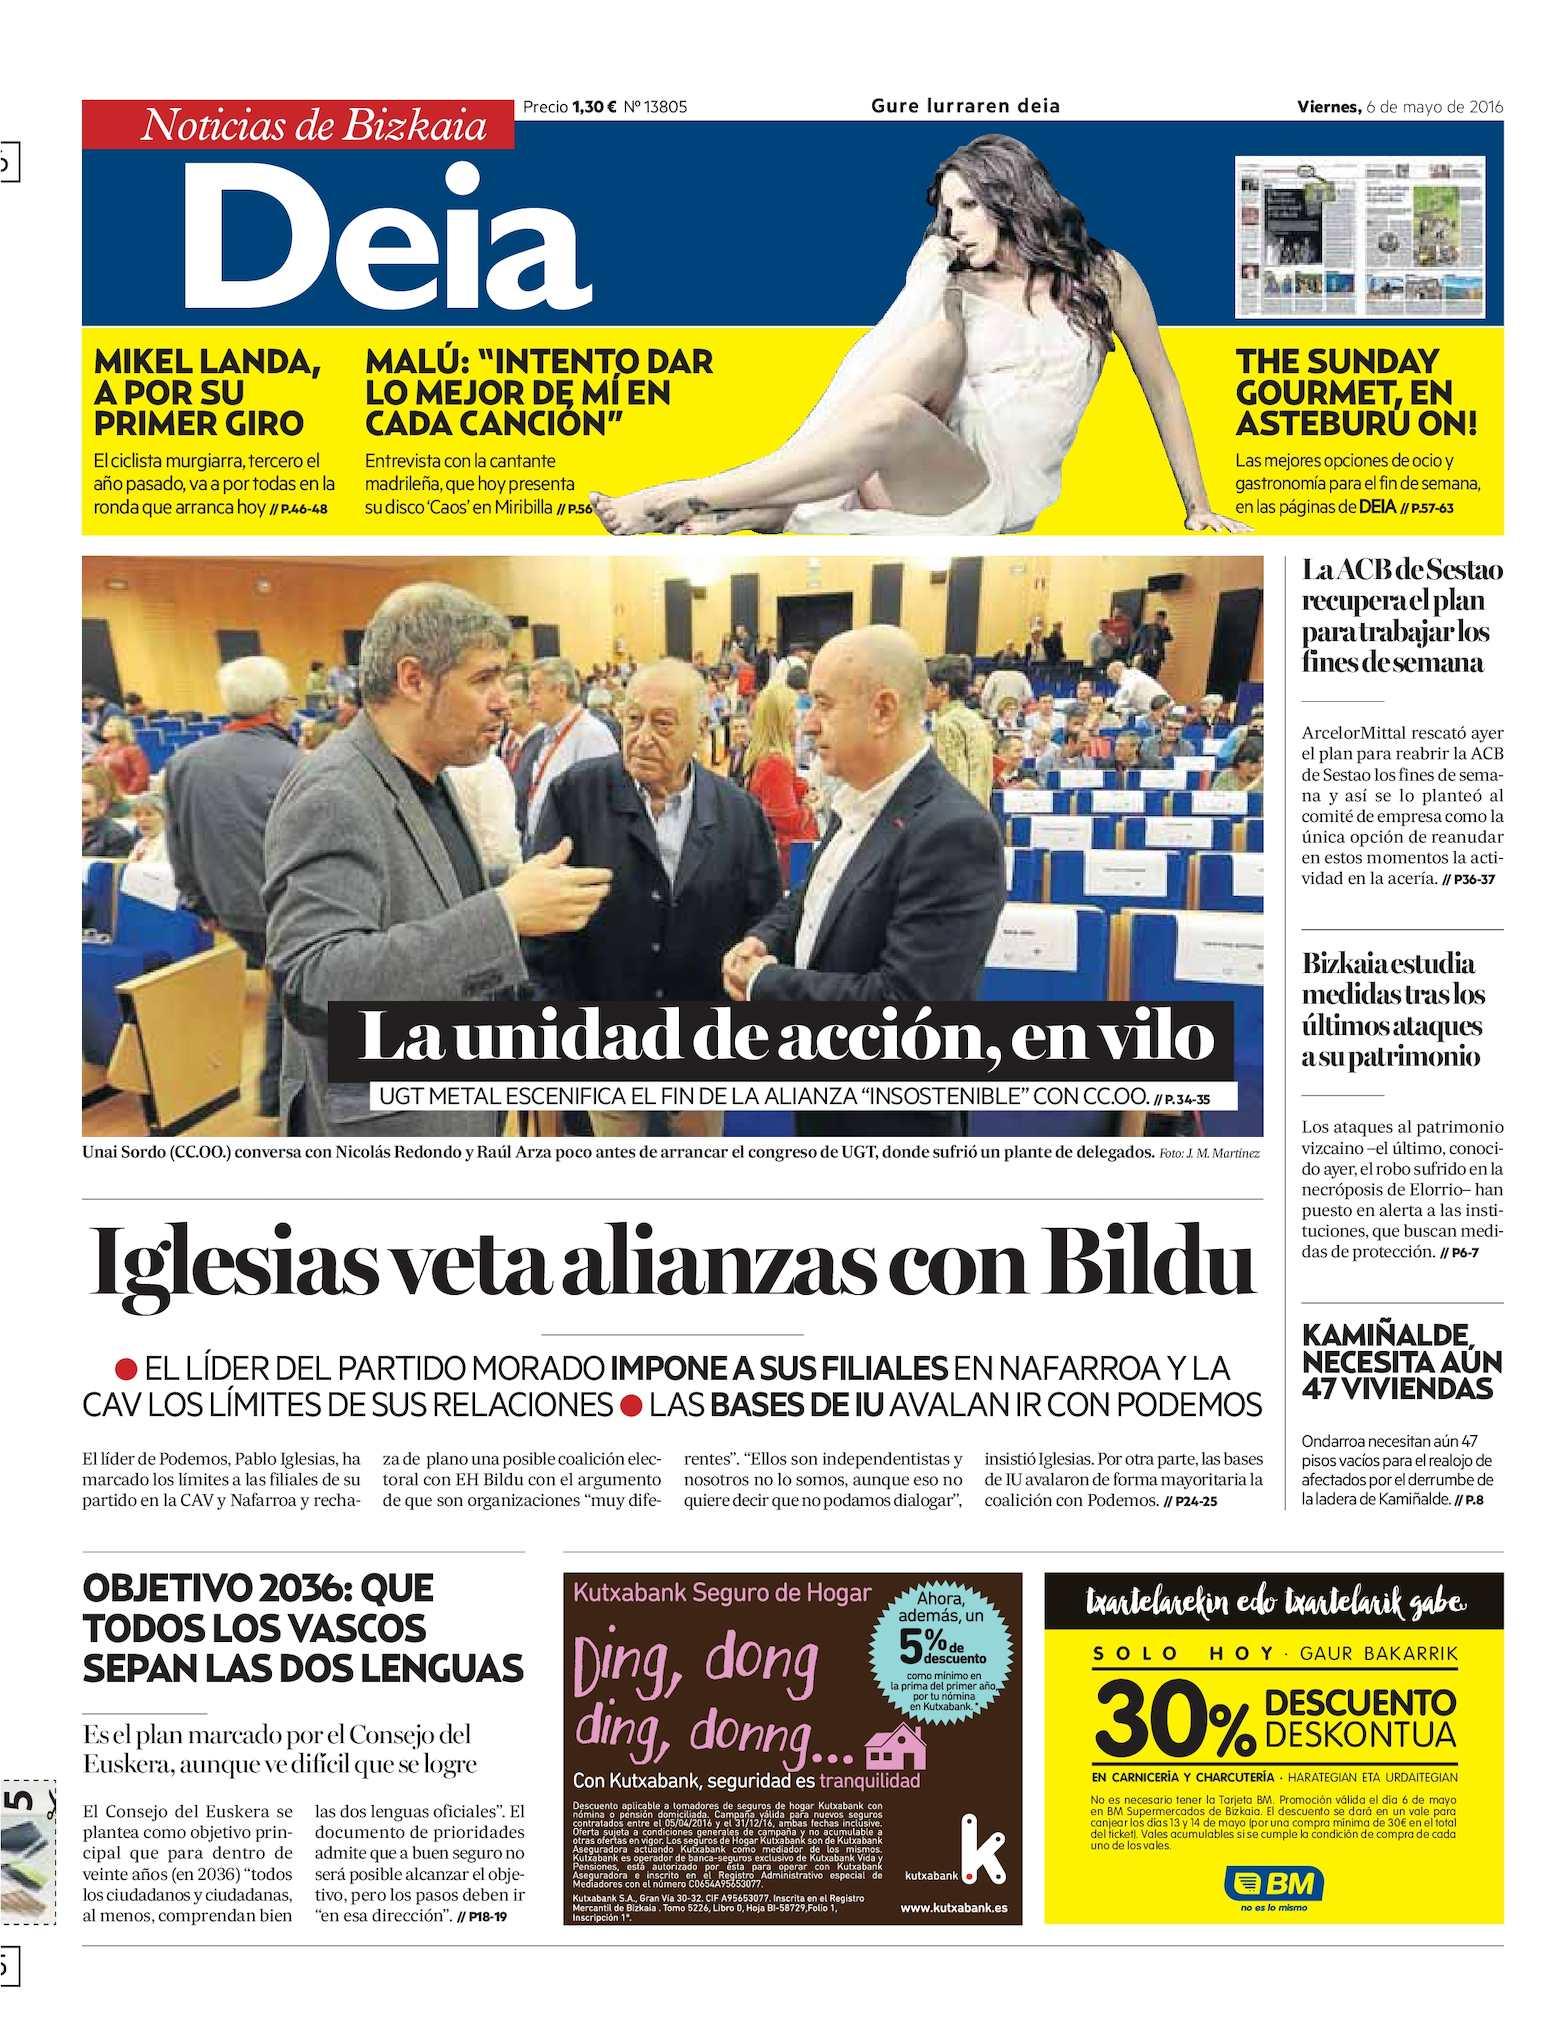 Calaméo - Deia 20160506